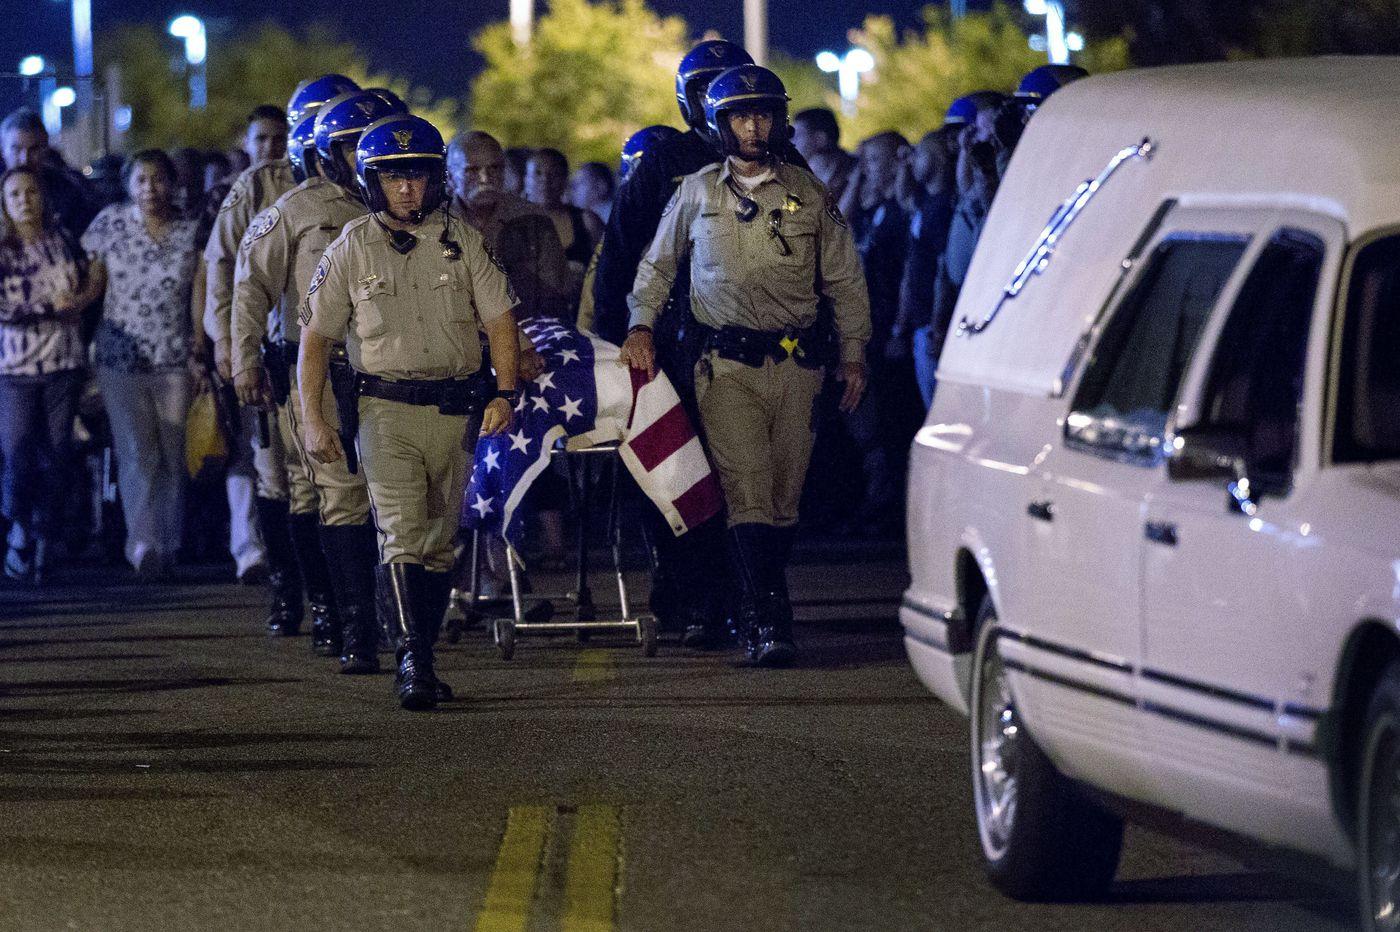 California freeway shootout leaves officer, gunman dead